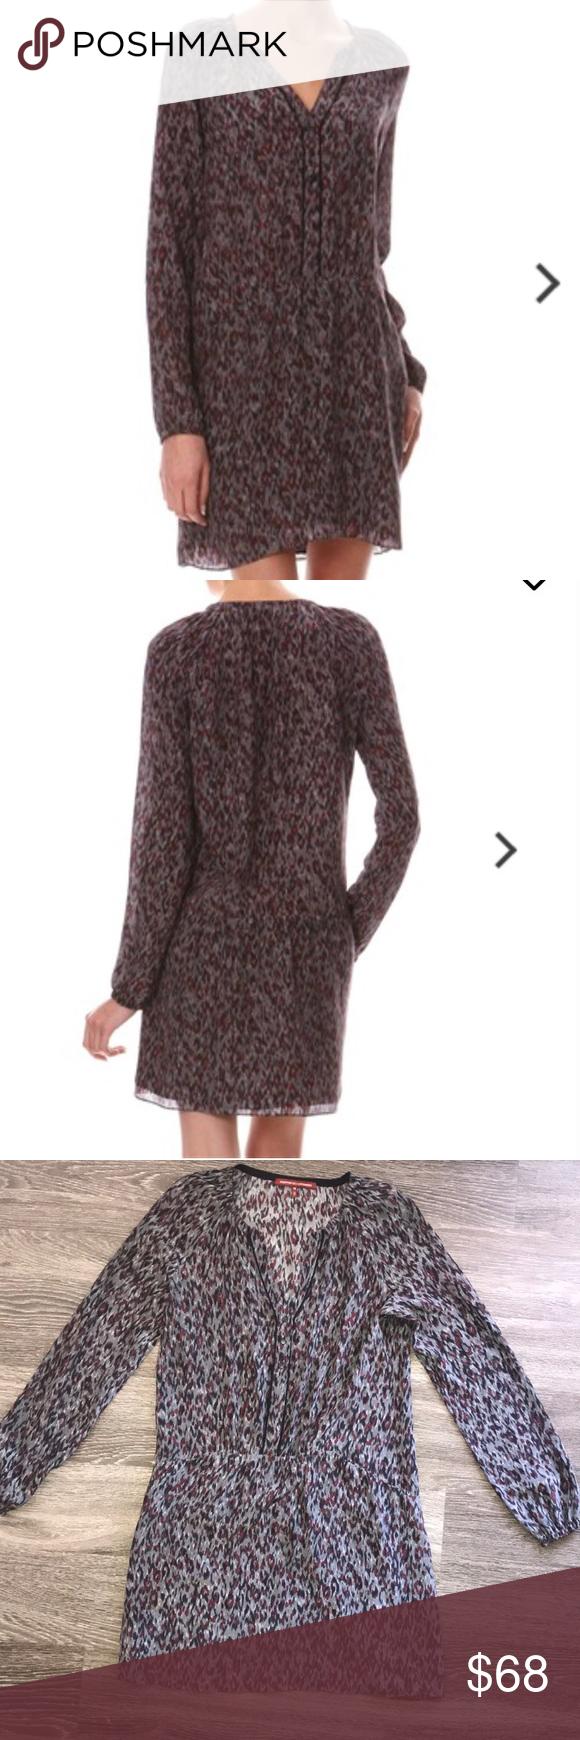 Comtoir Des Cotonniers Pucket Silk Dress Clothes Design Dropwaist Dress Fashion